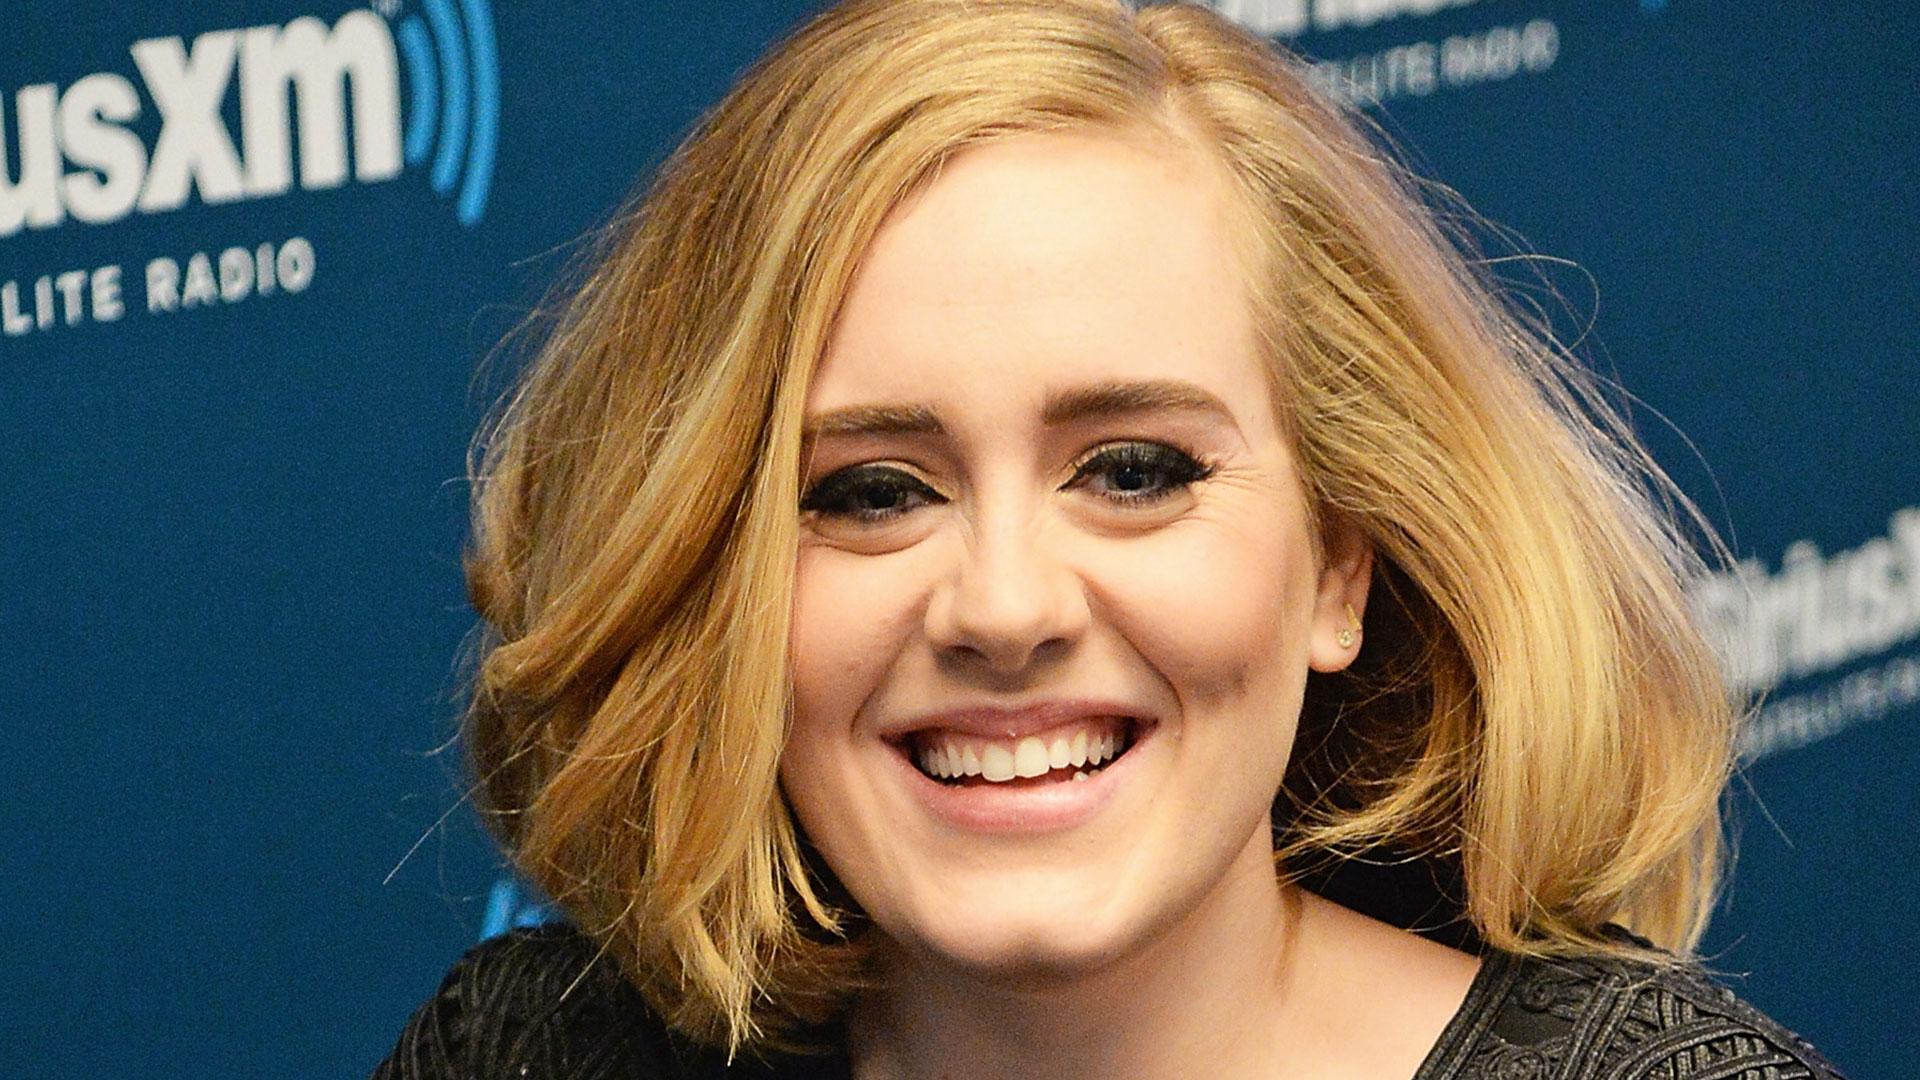 Adele will host next week's Saturday Night Live